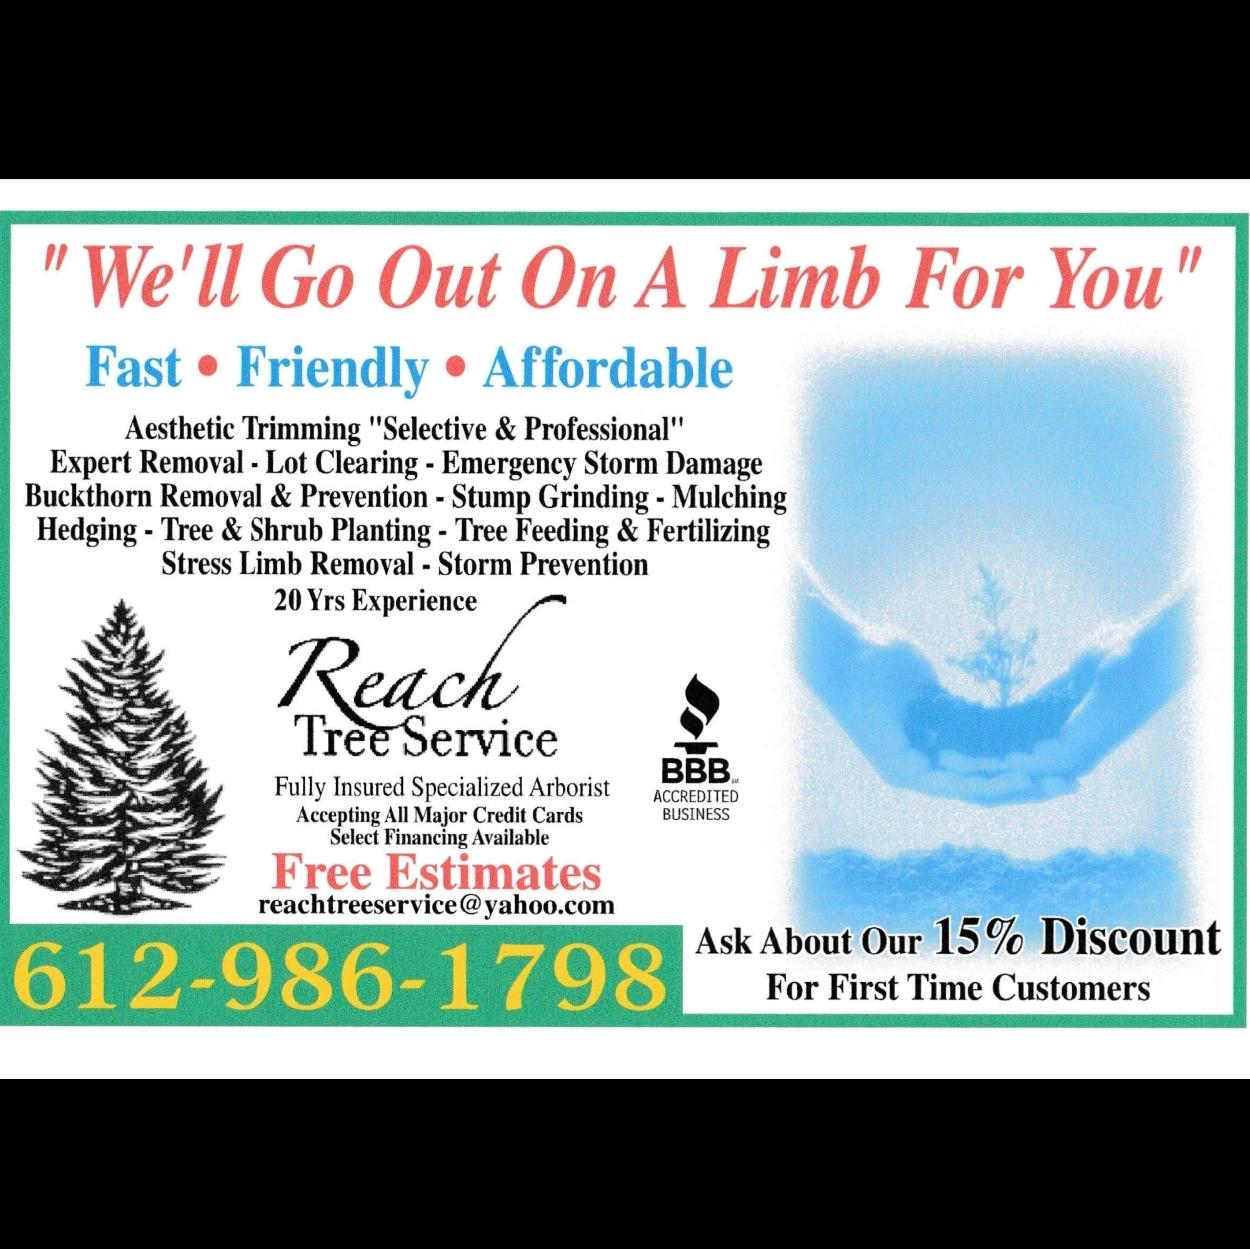 Reach Tree Service